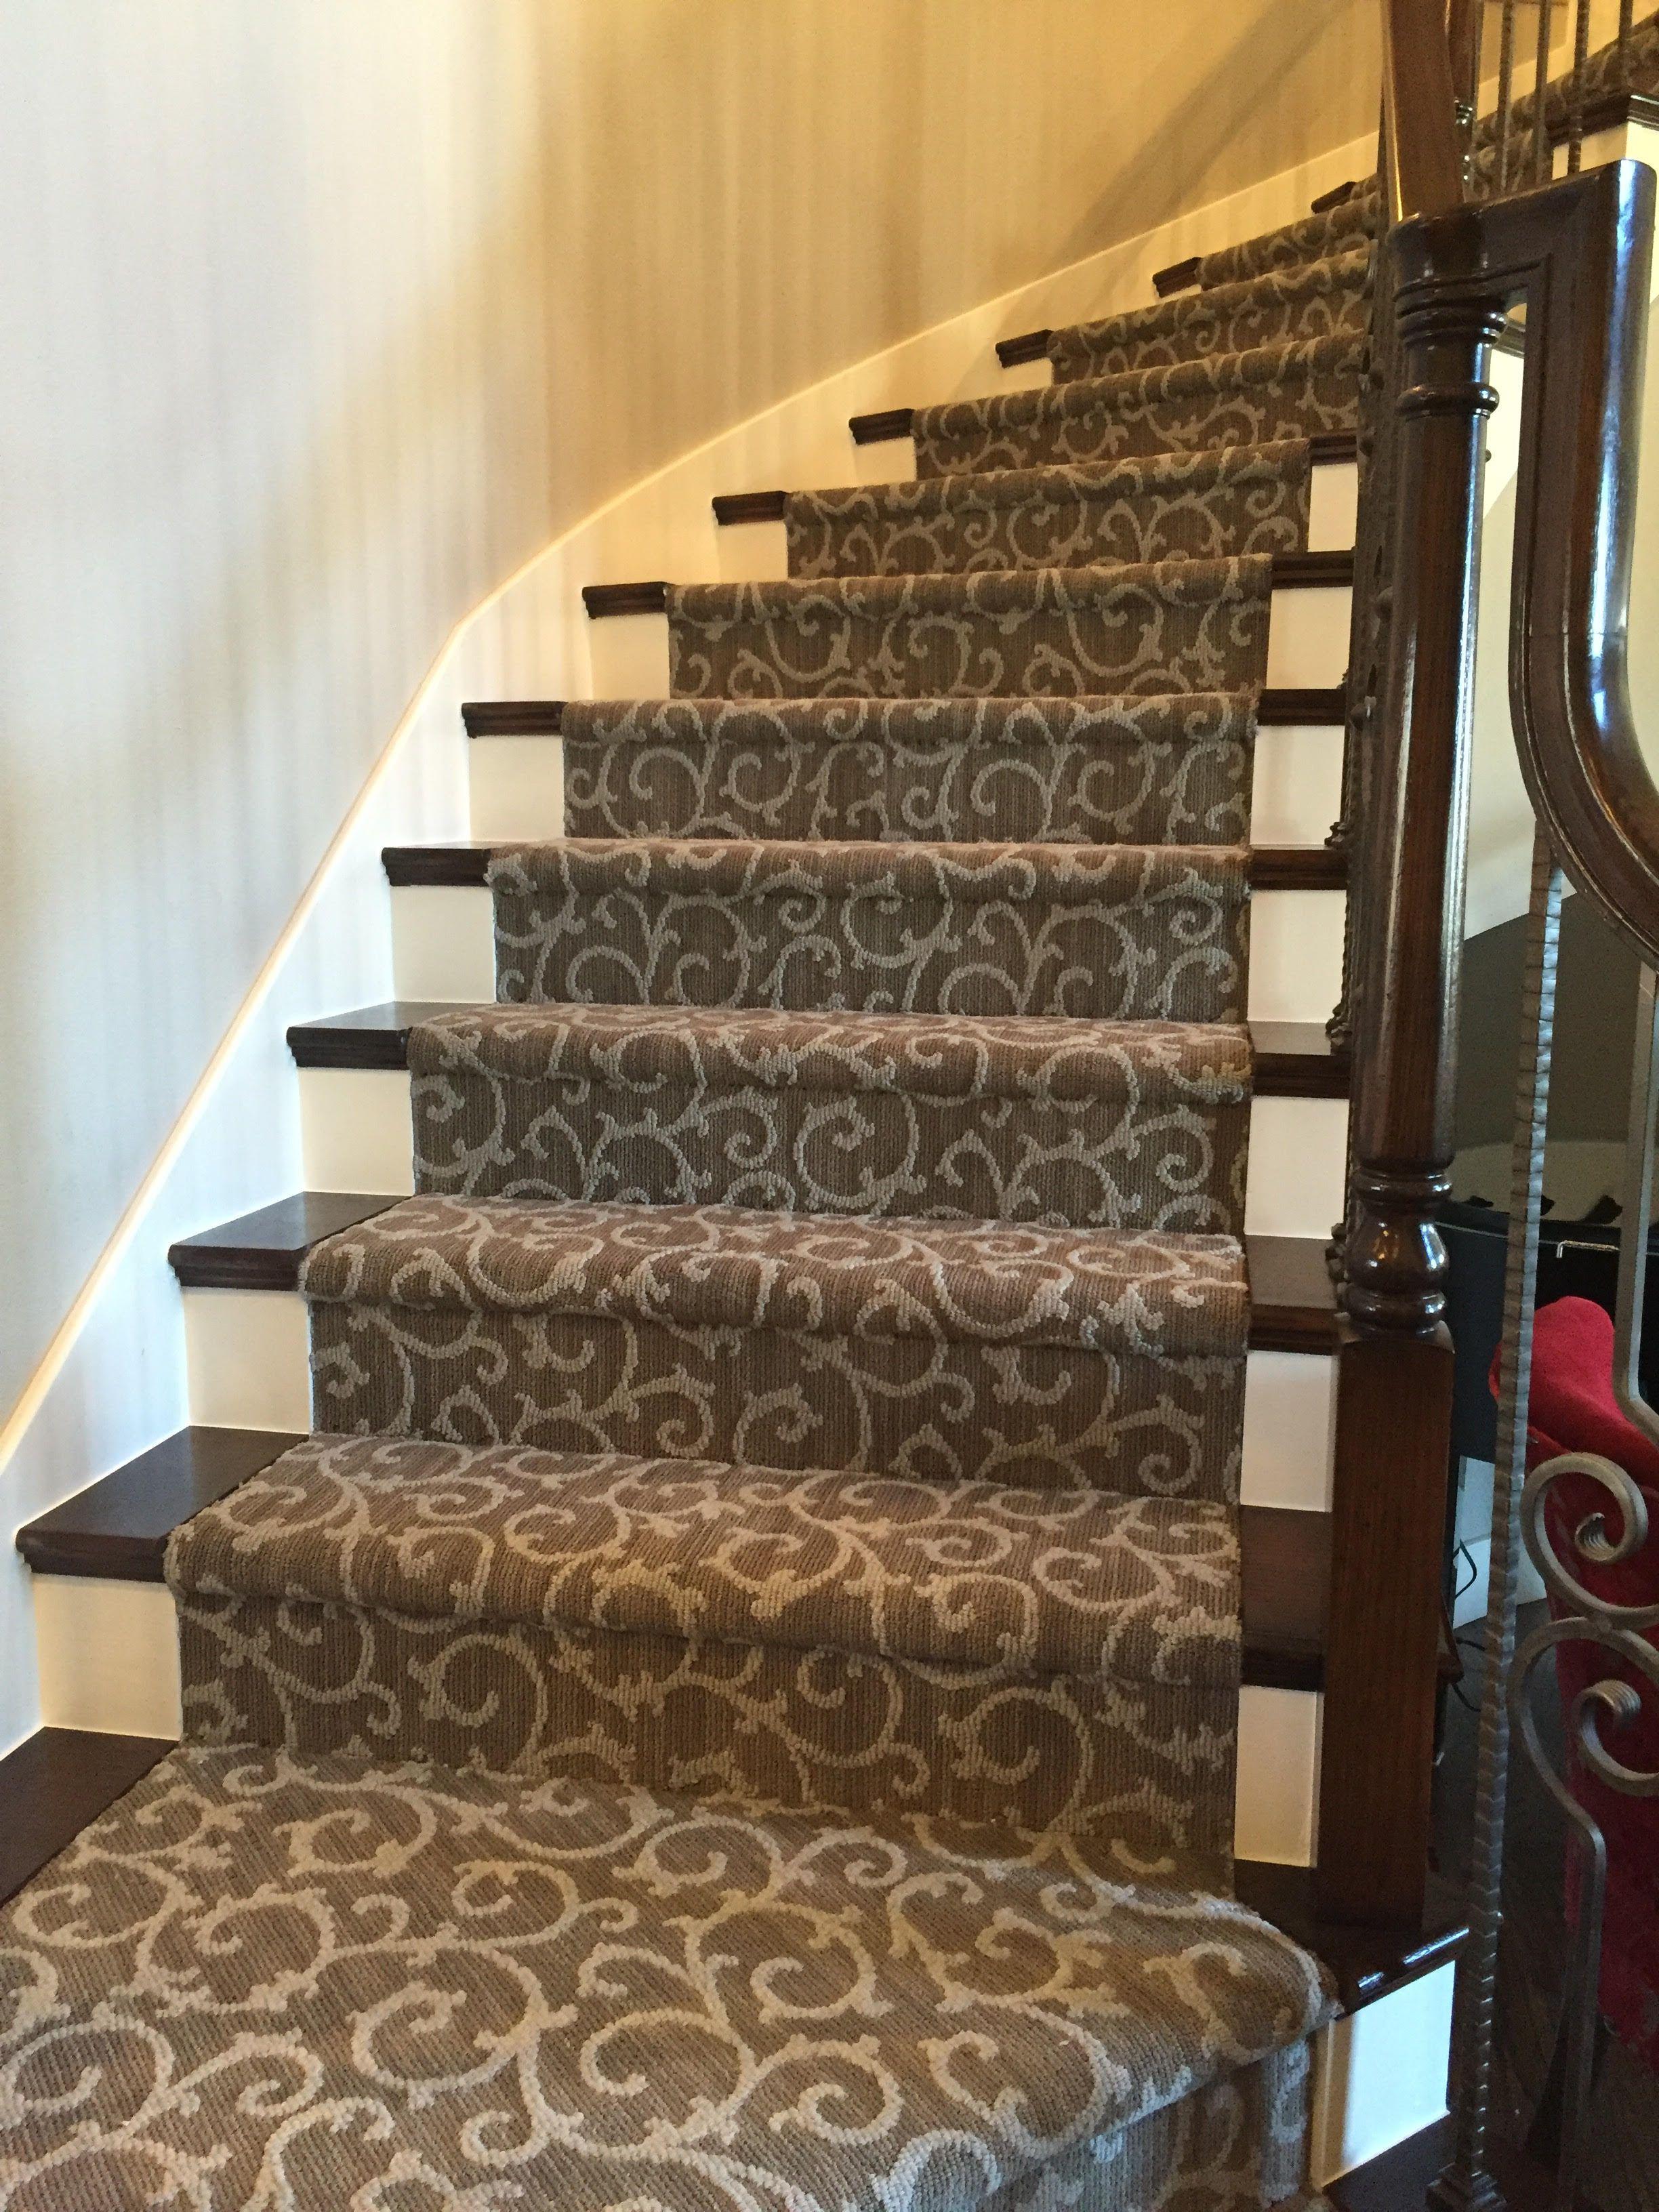 Mallorca Z6890 00556 Carpet Flooring Anderson Tuftex   Stair Carpets For Sale   Wool   Flooring   Skid   Anderson Tuftex   Mallorca